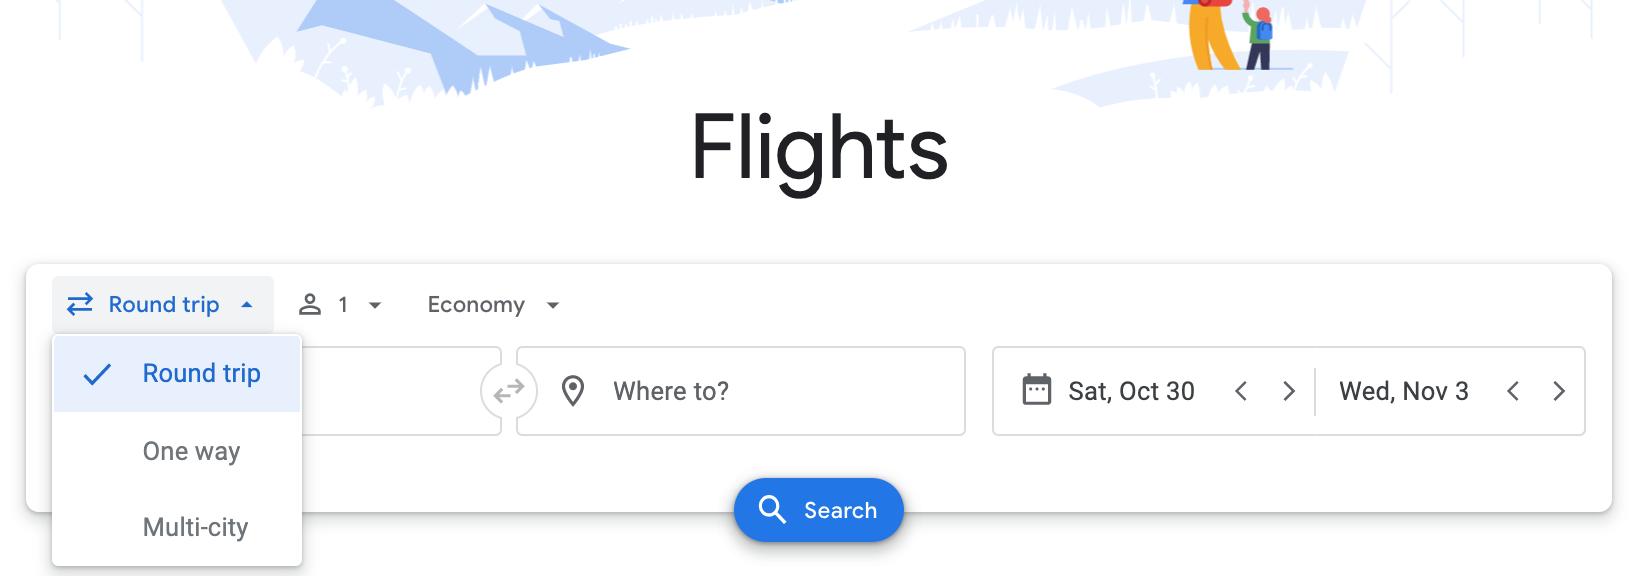 screenshot showing flight options drop down menu on Google Flights.